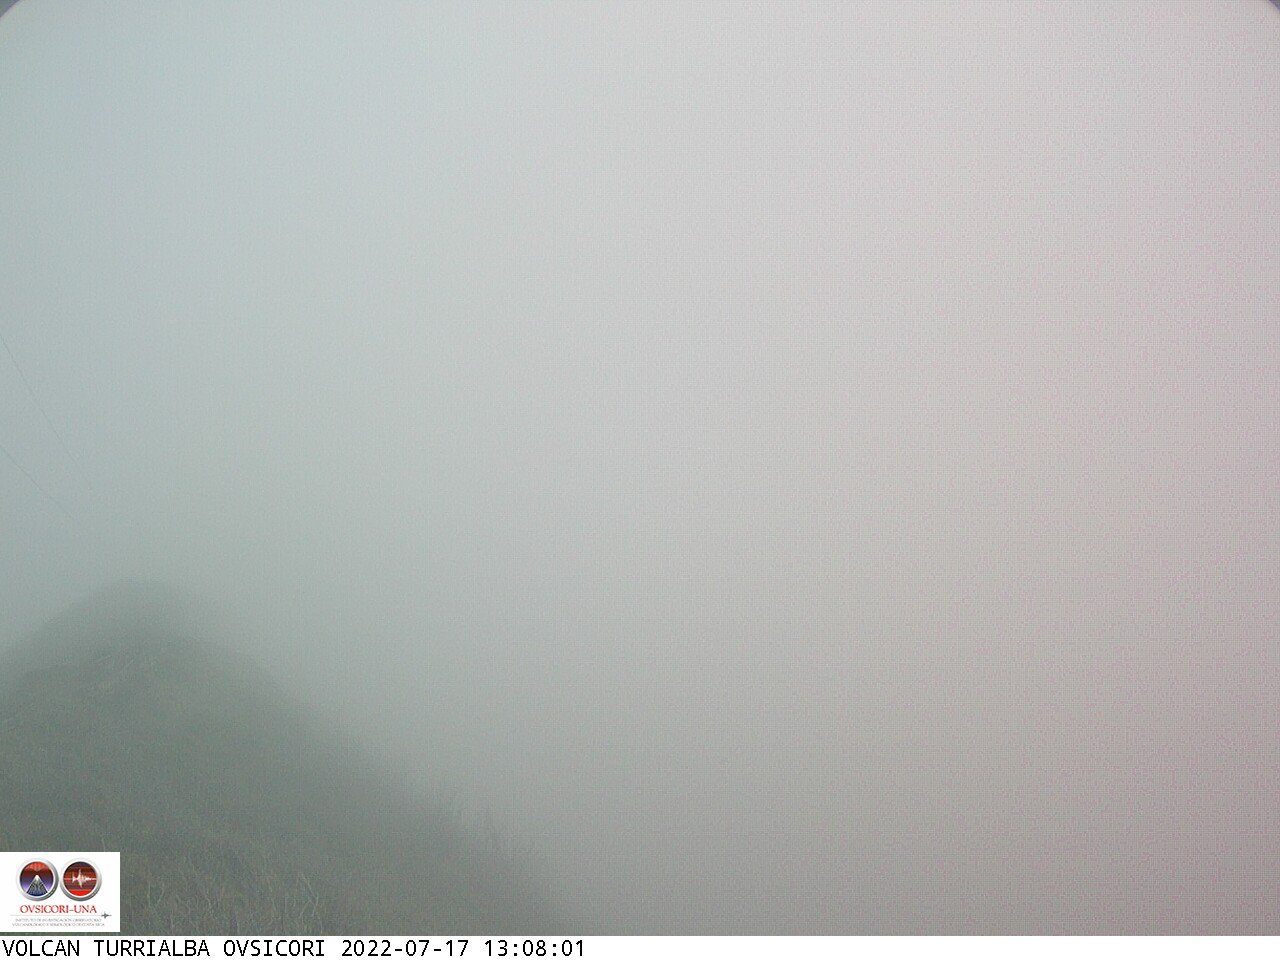 Volcano Turrialba Sun. 13:08